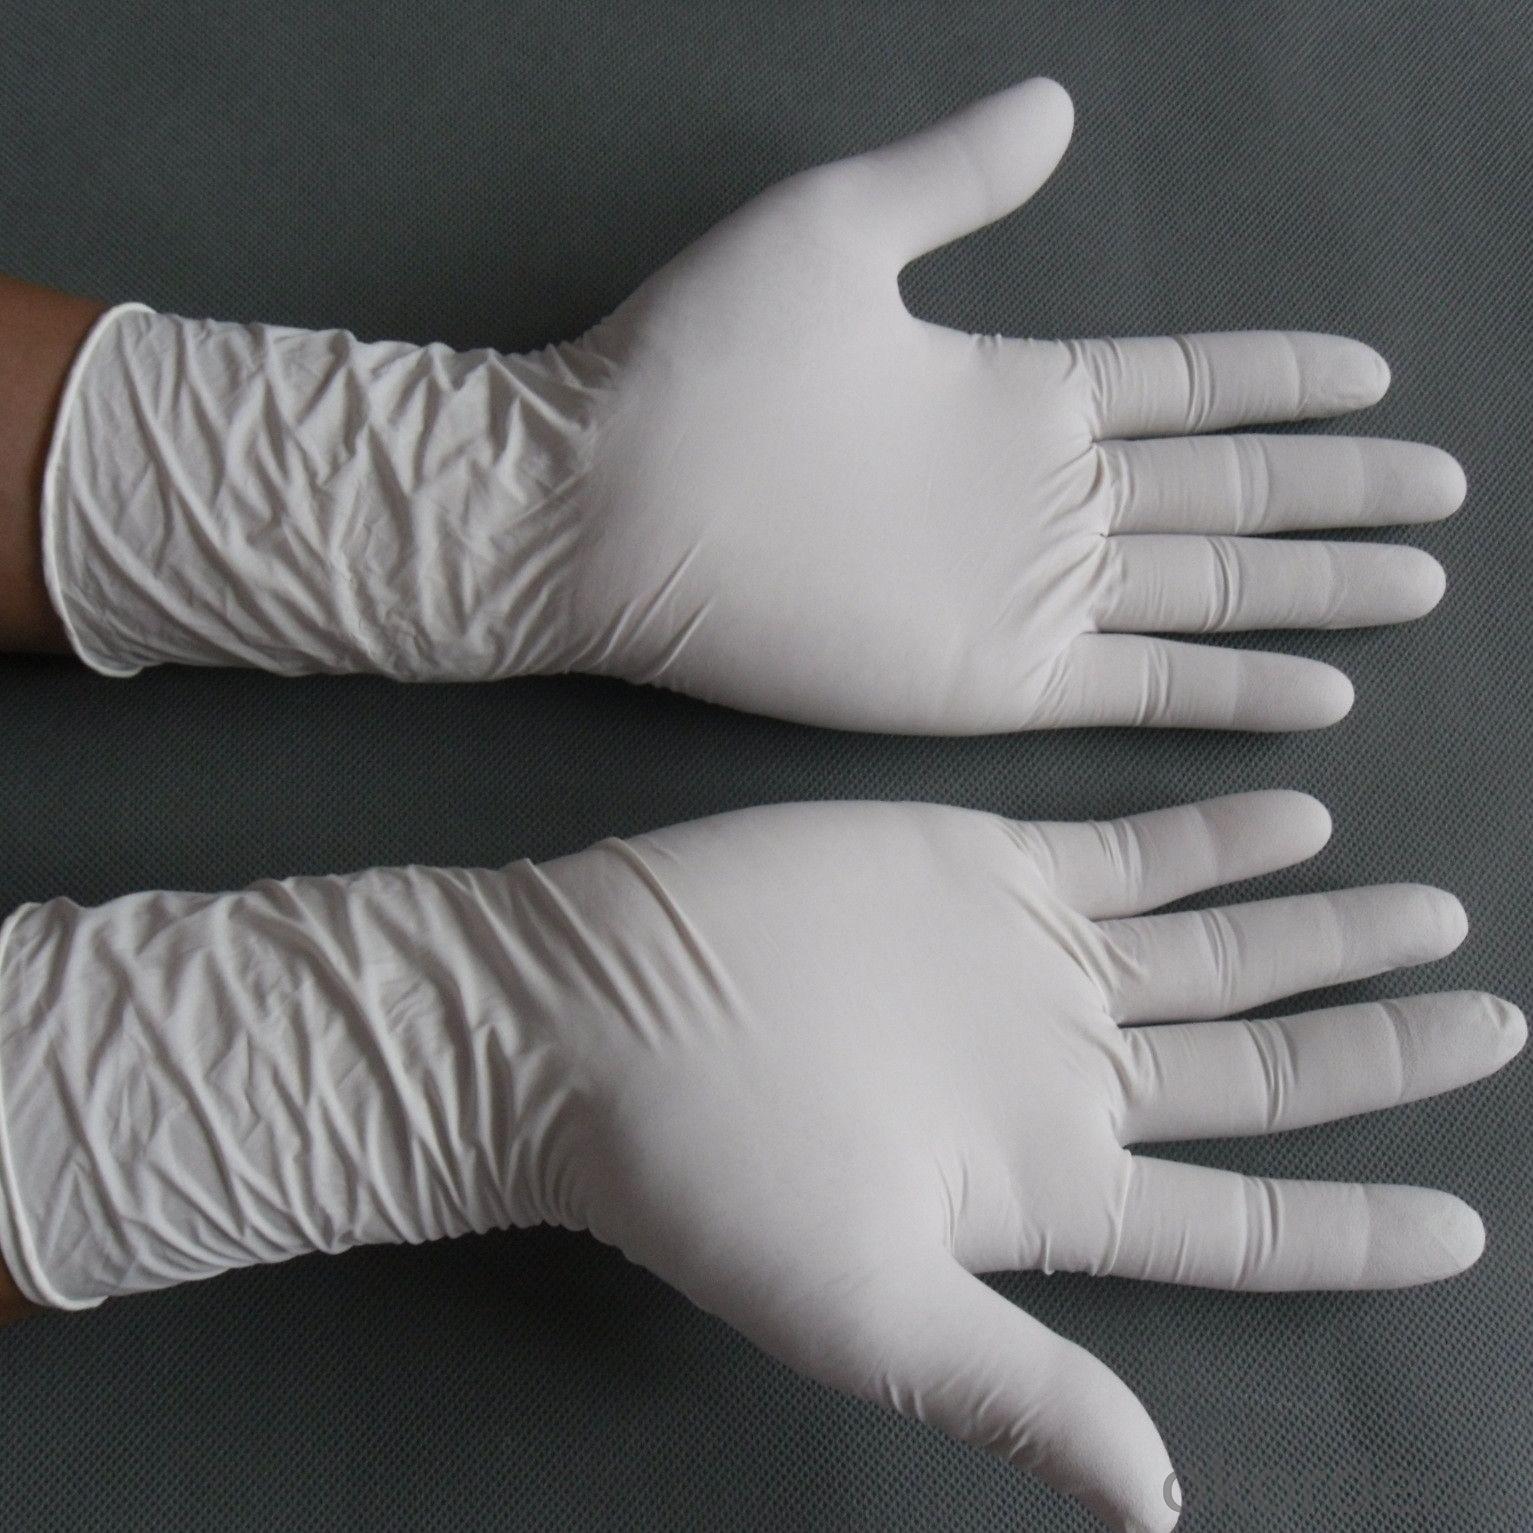 Medical Examination Latex Gloves, Powdered or Powder Free Made by MY MEDICAL